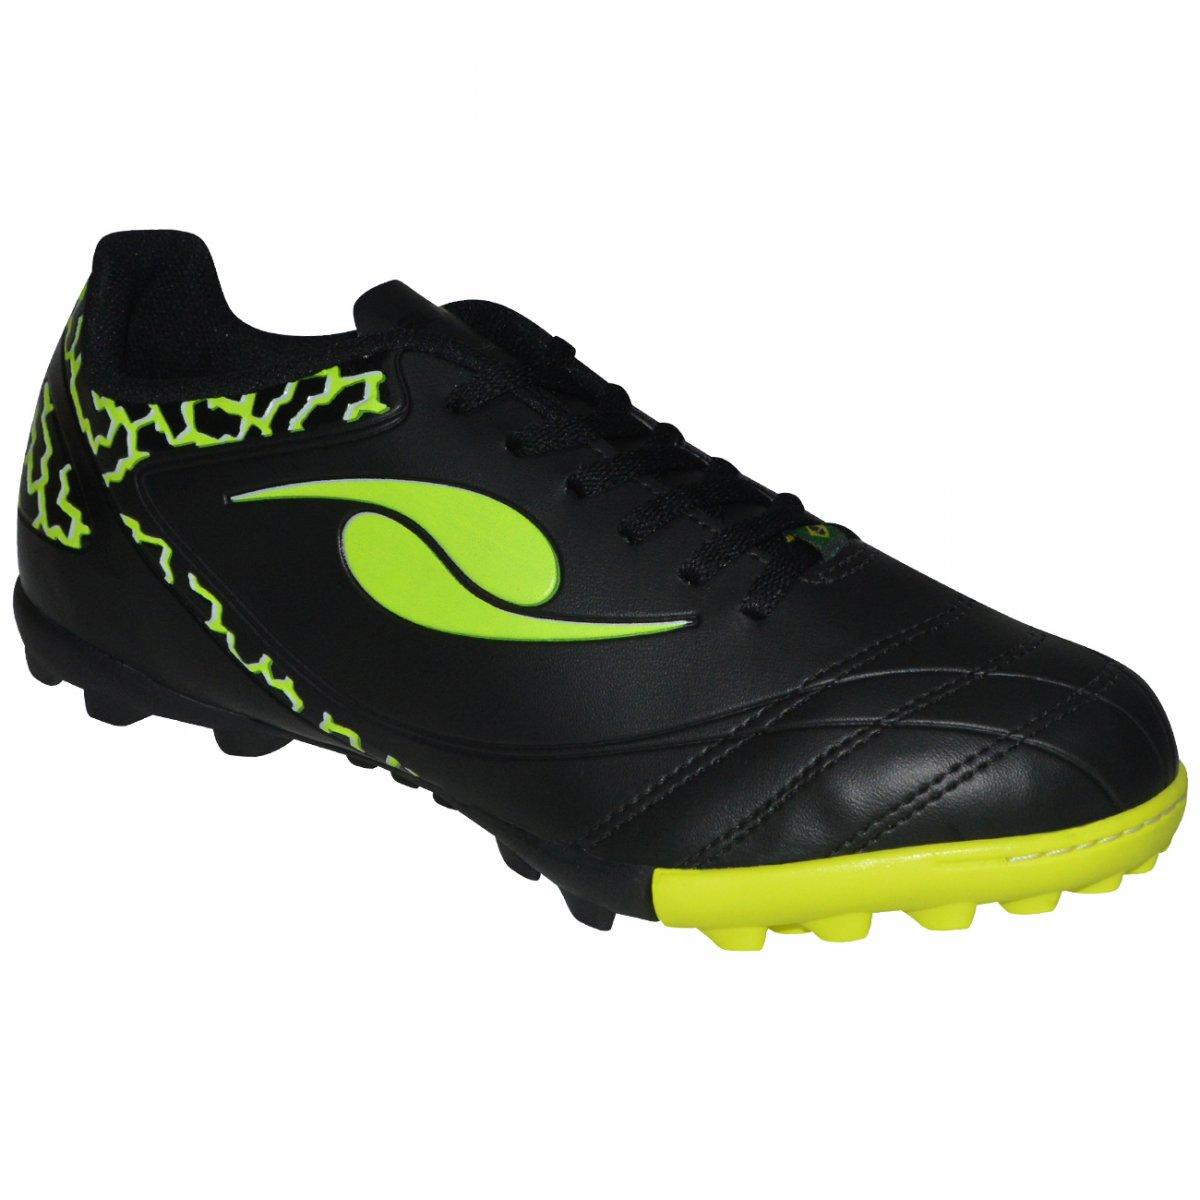 08cc94102bdc6 Chuteira Society Dal Ponte Eletric 81229797 - Preto limão - Chuteira Nike